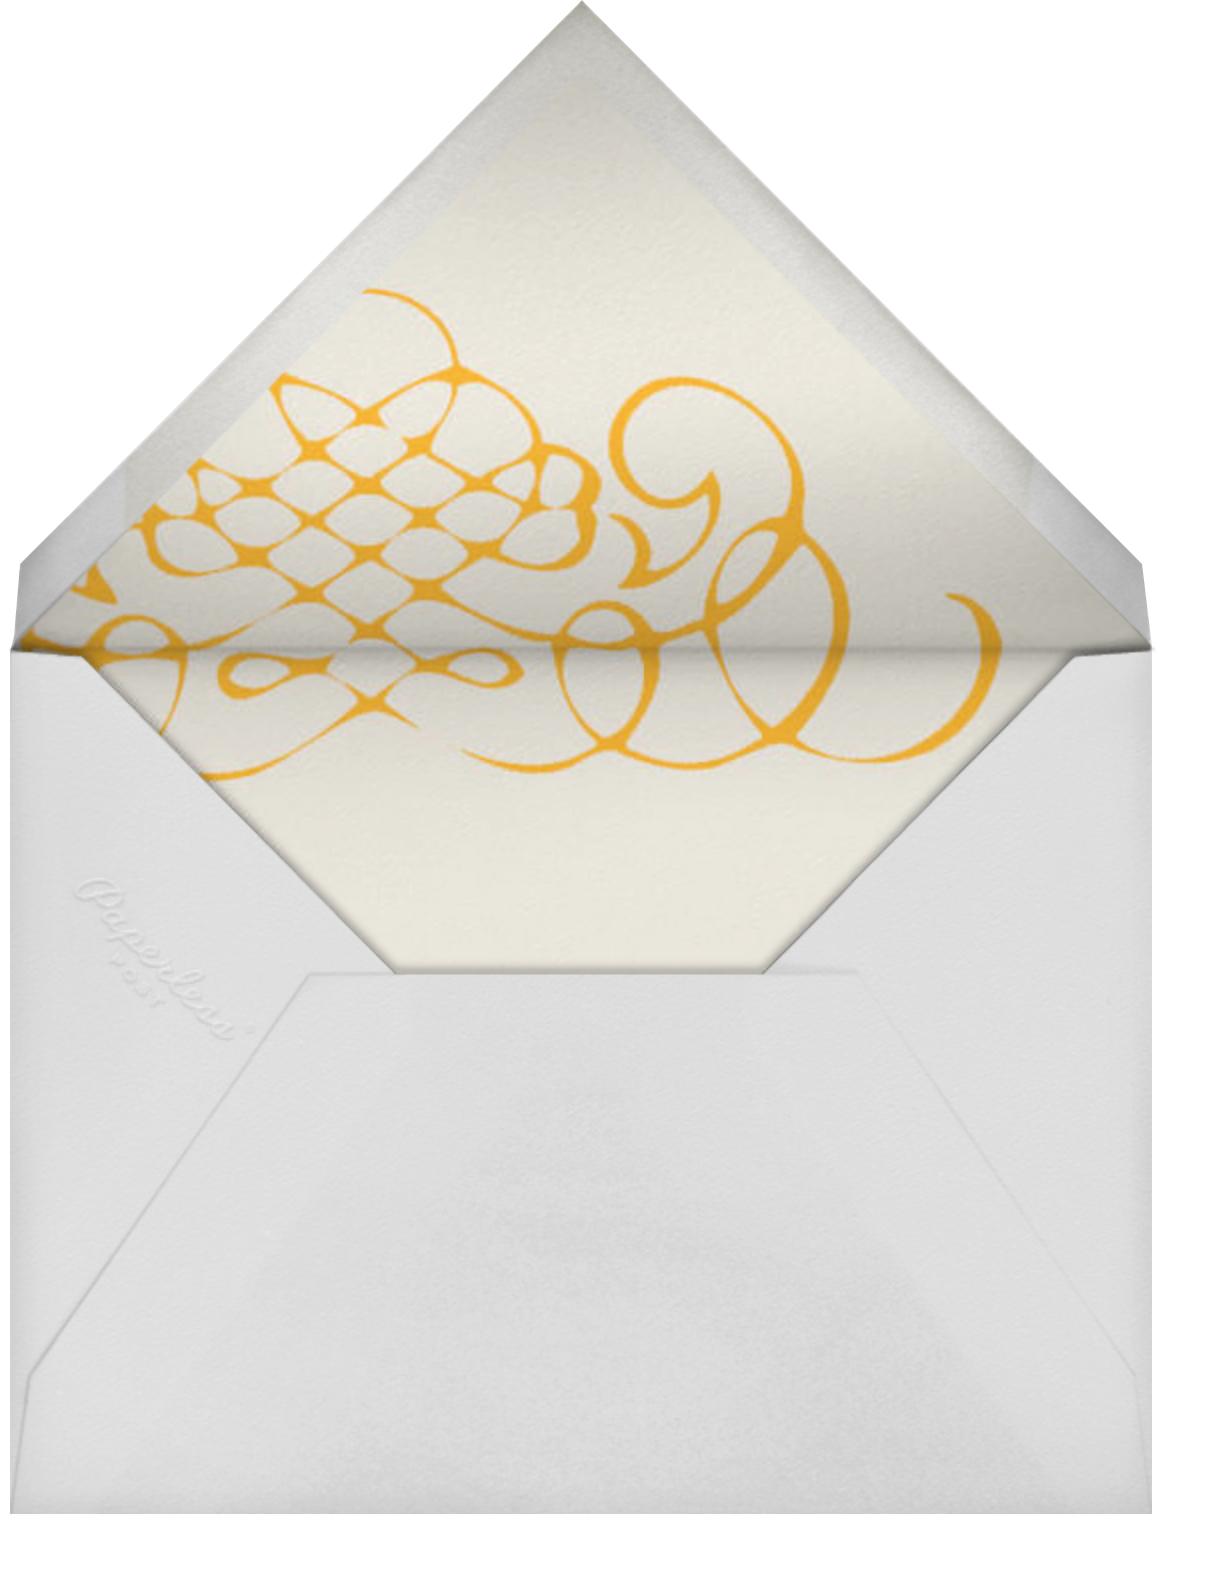 Antique Press- Cream with Mango (Horizontal) - Paperless Post - General - envelope back